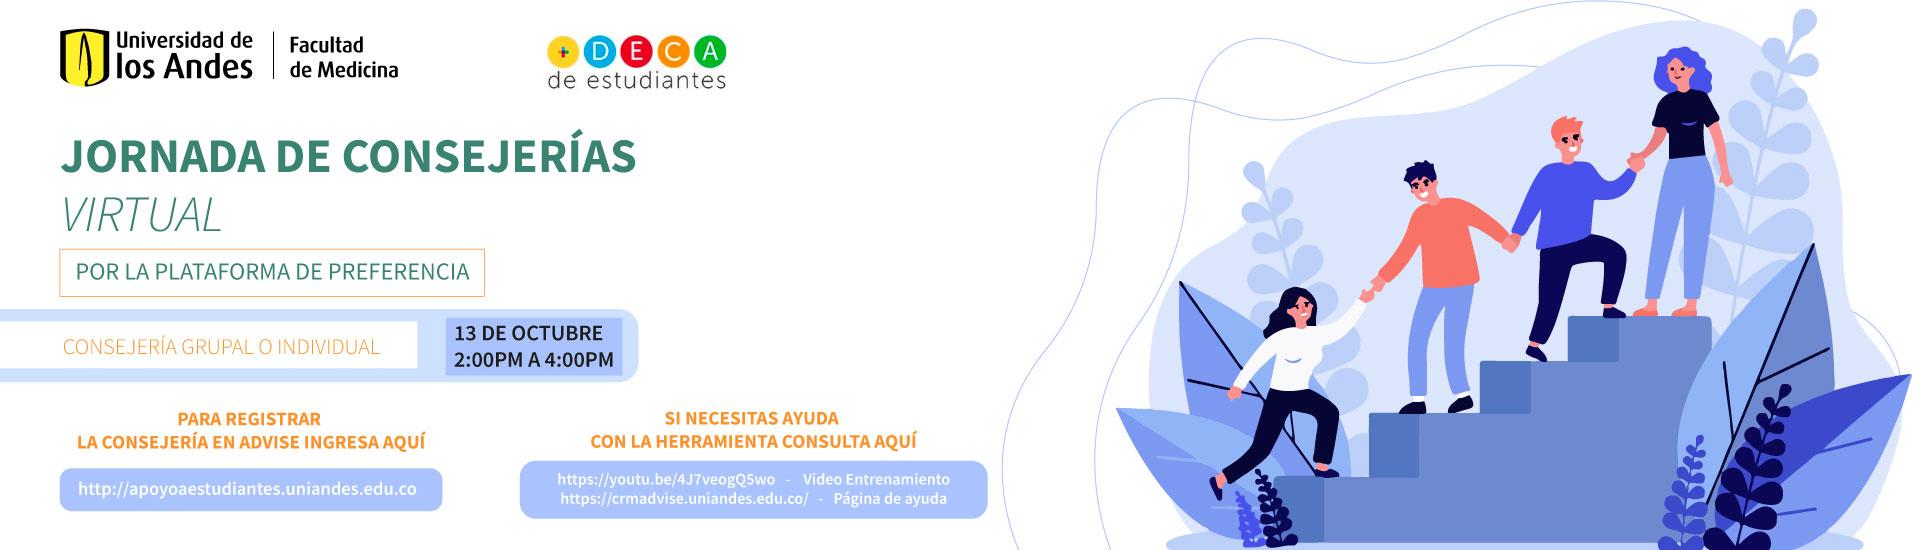 JORNADA DE CONSEJERÍAS VIRTUAL